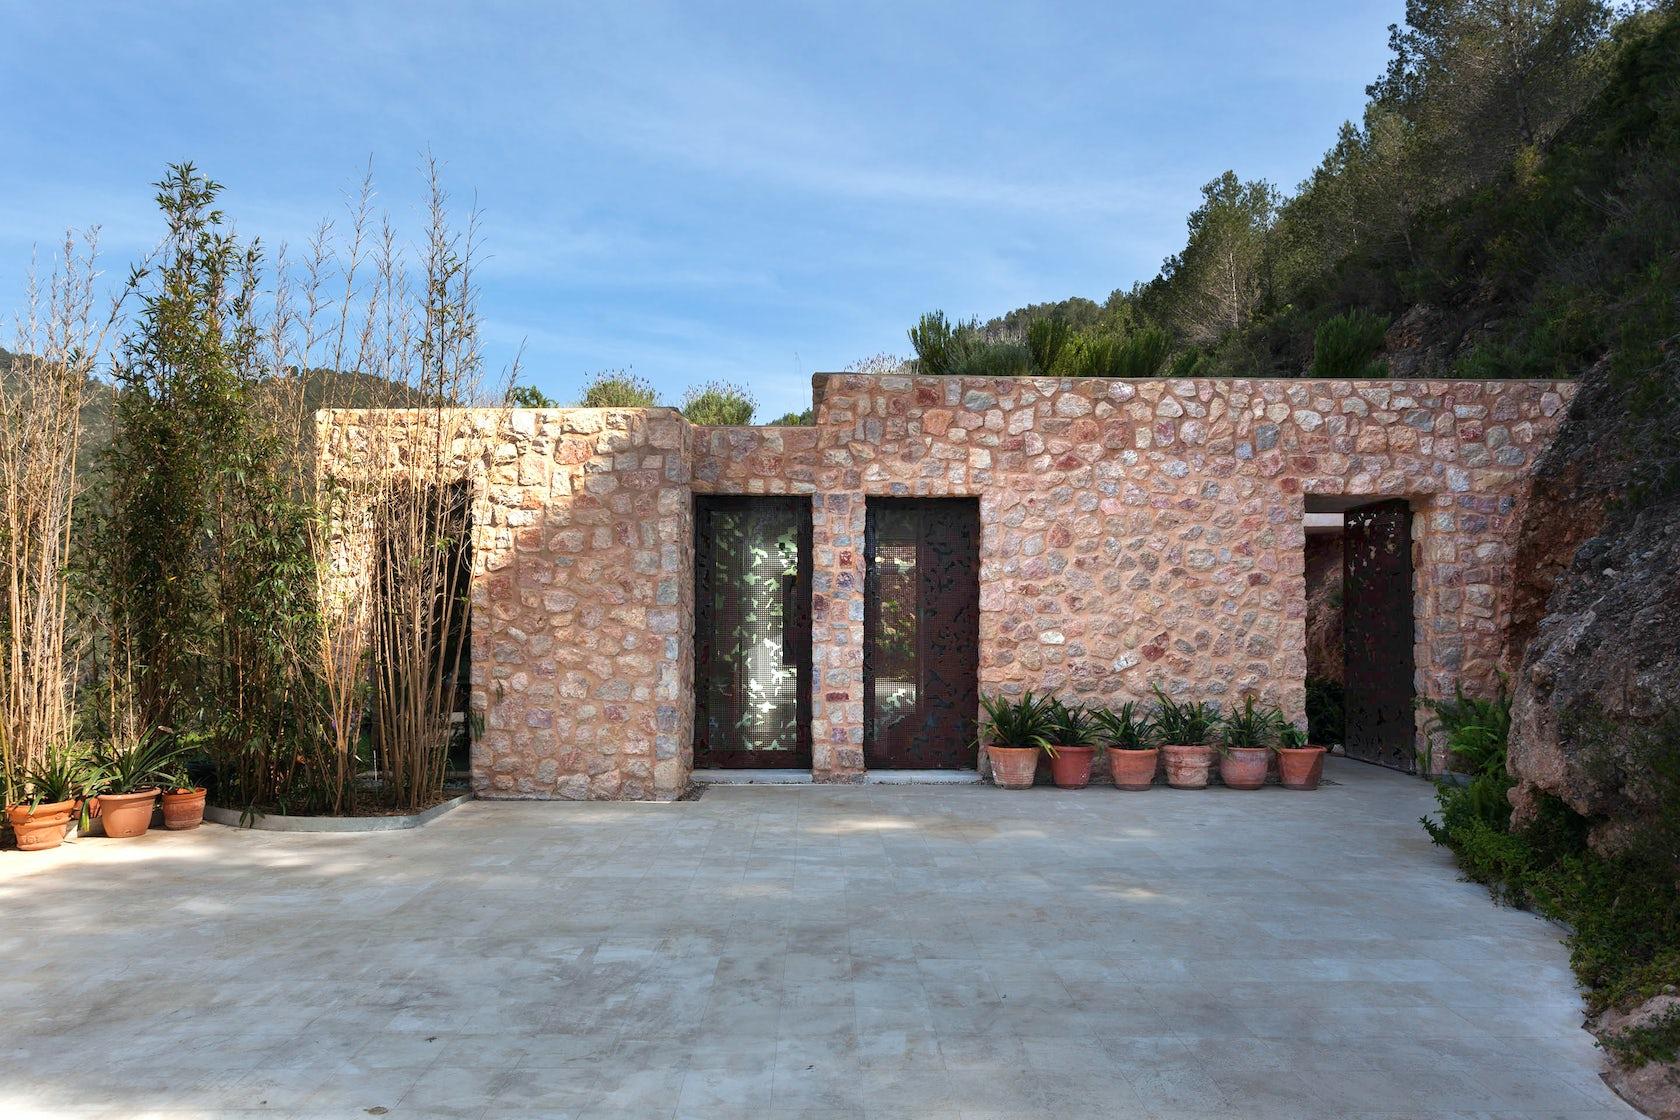 Casa en favara architizer - Altarriba valencia ...